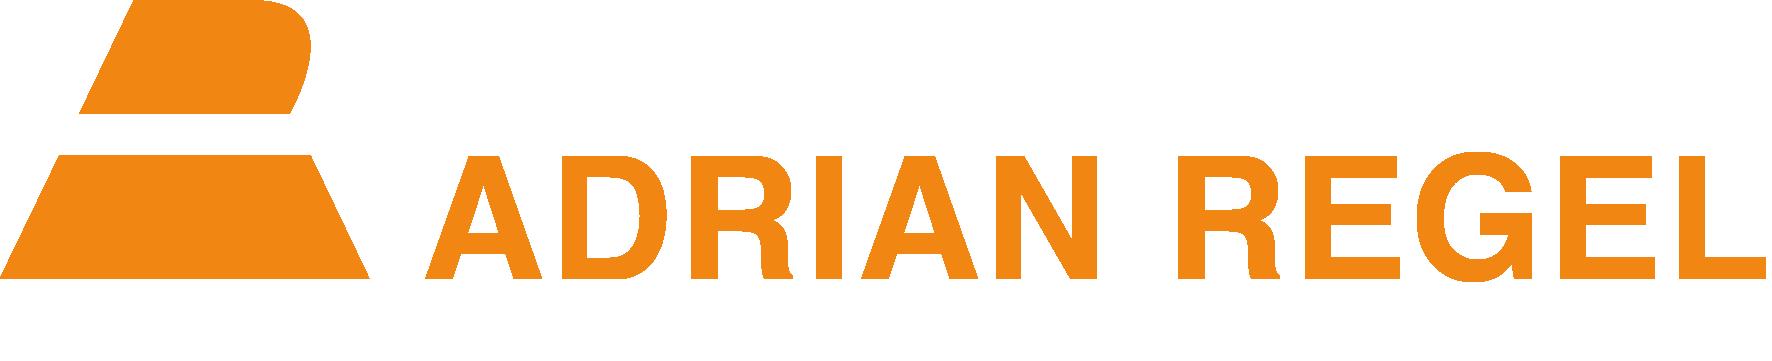 aregel_logo_ci_name_orange